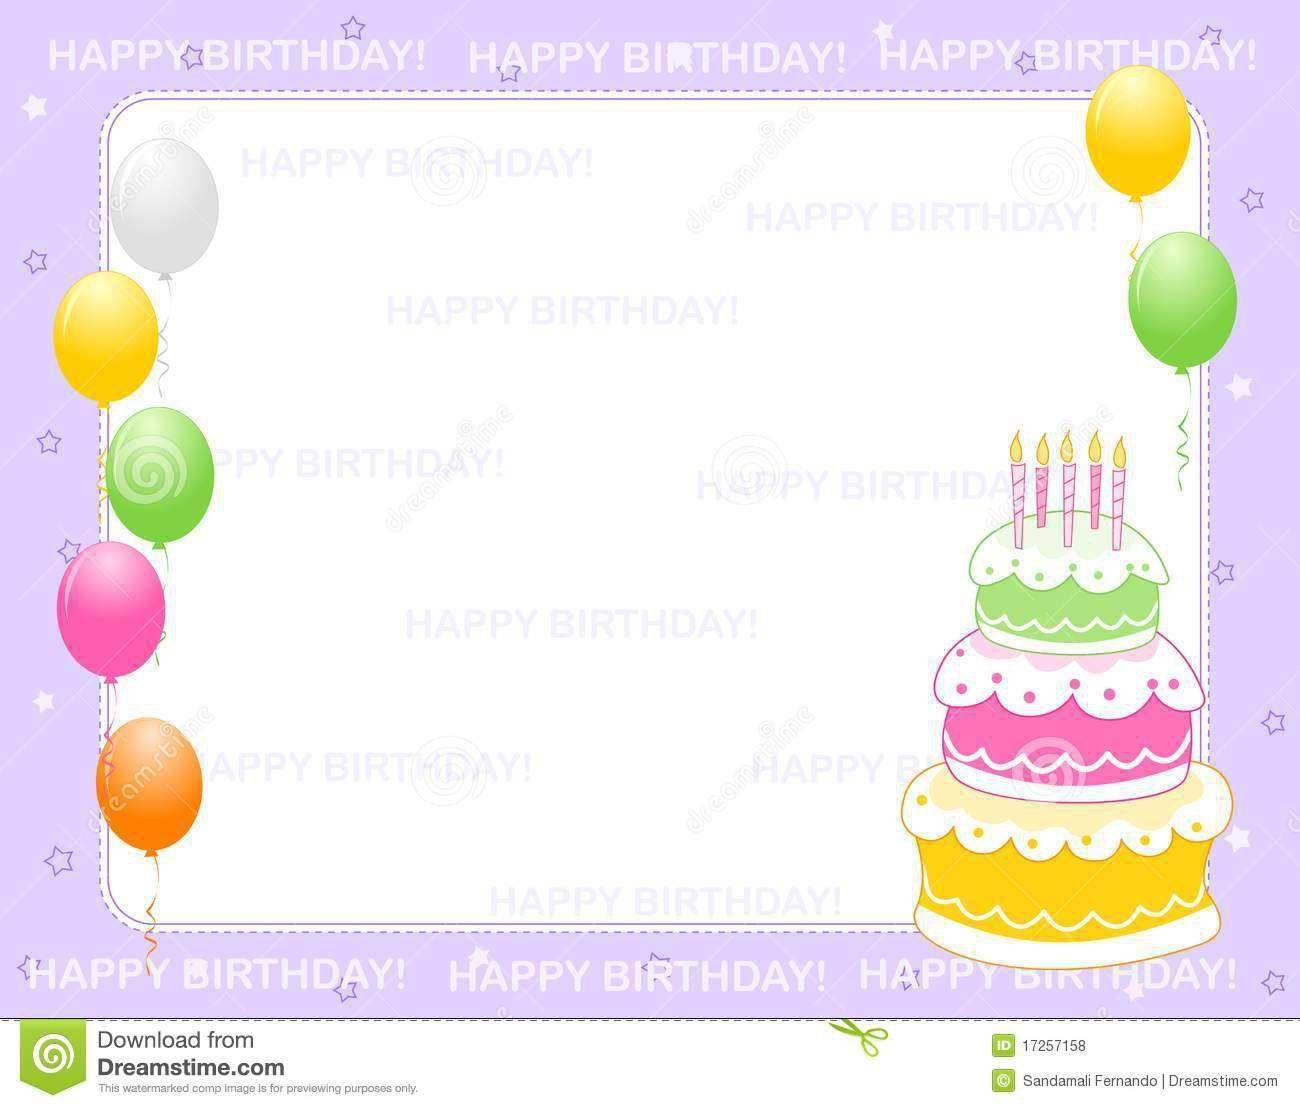 005 Marvelou Birthday Invitation Card Word Format Example  Template FreeFull